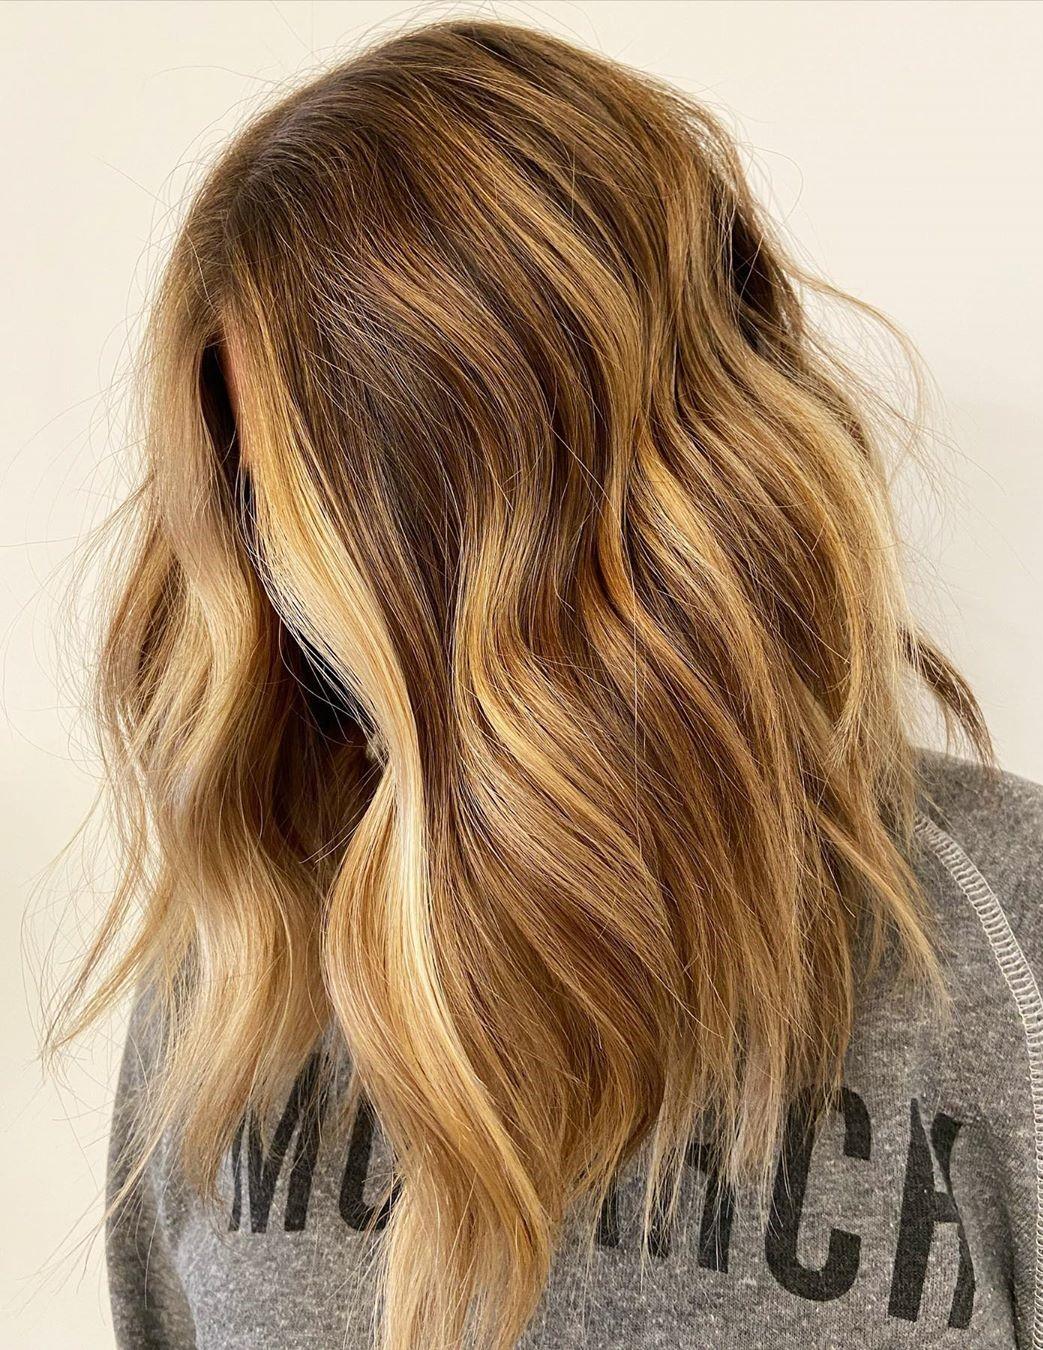 Red and Blonde Balayage Hair